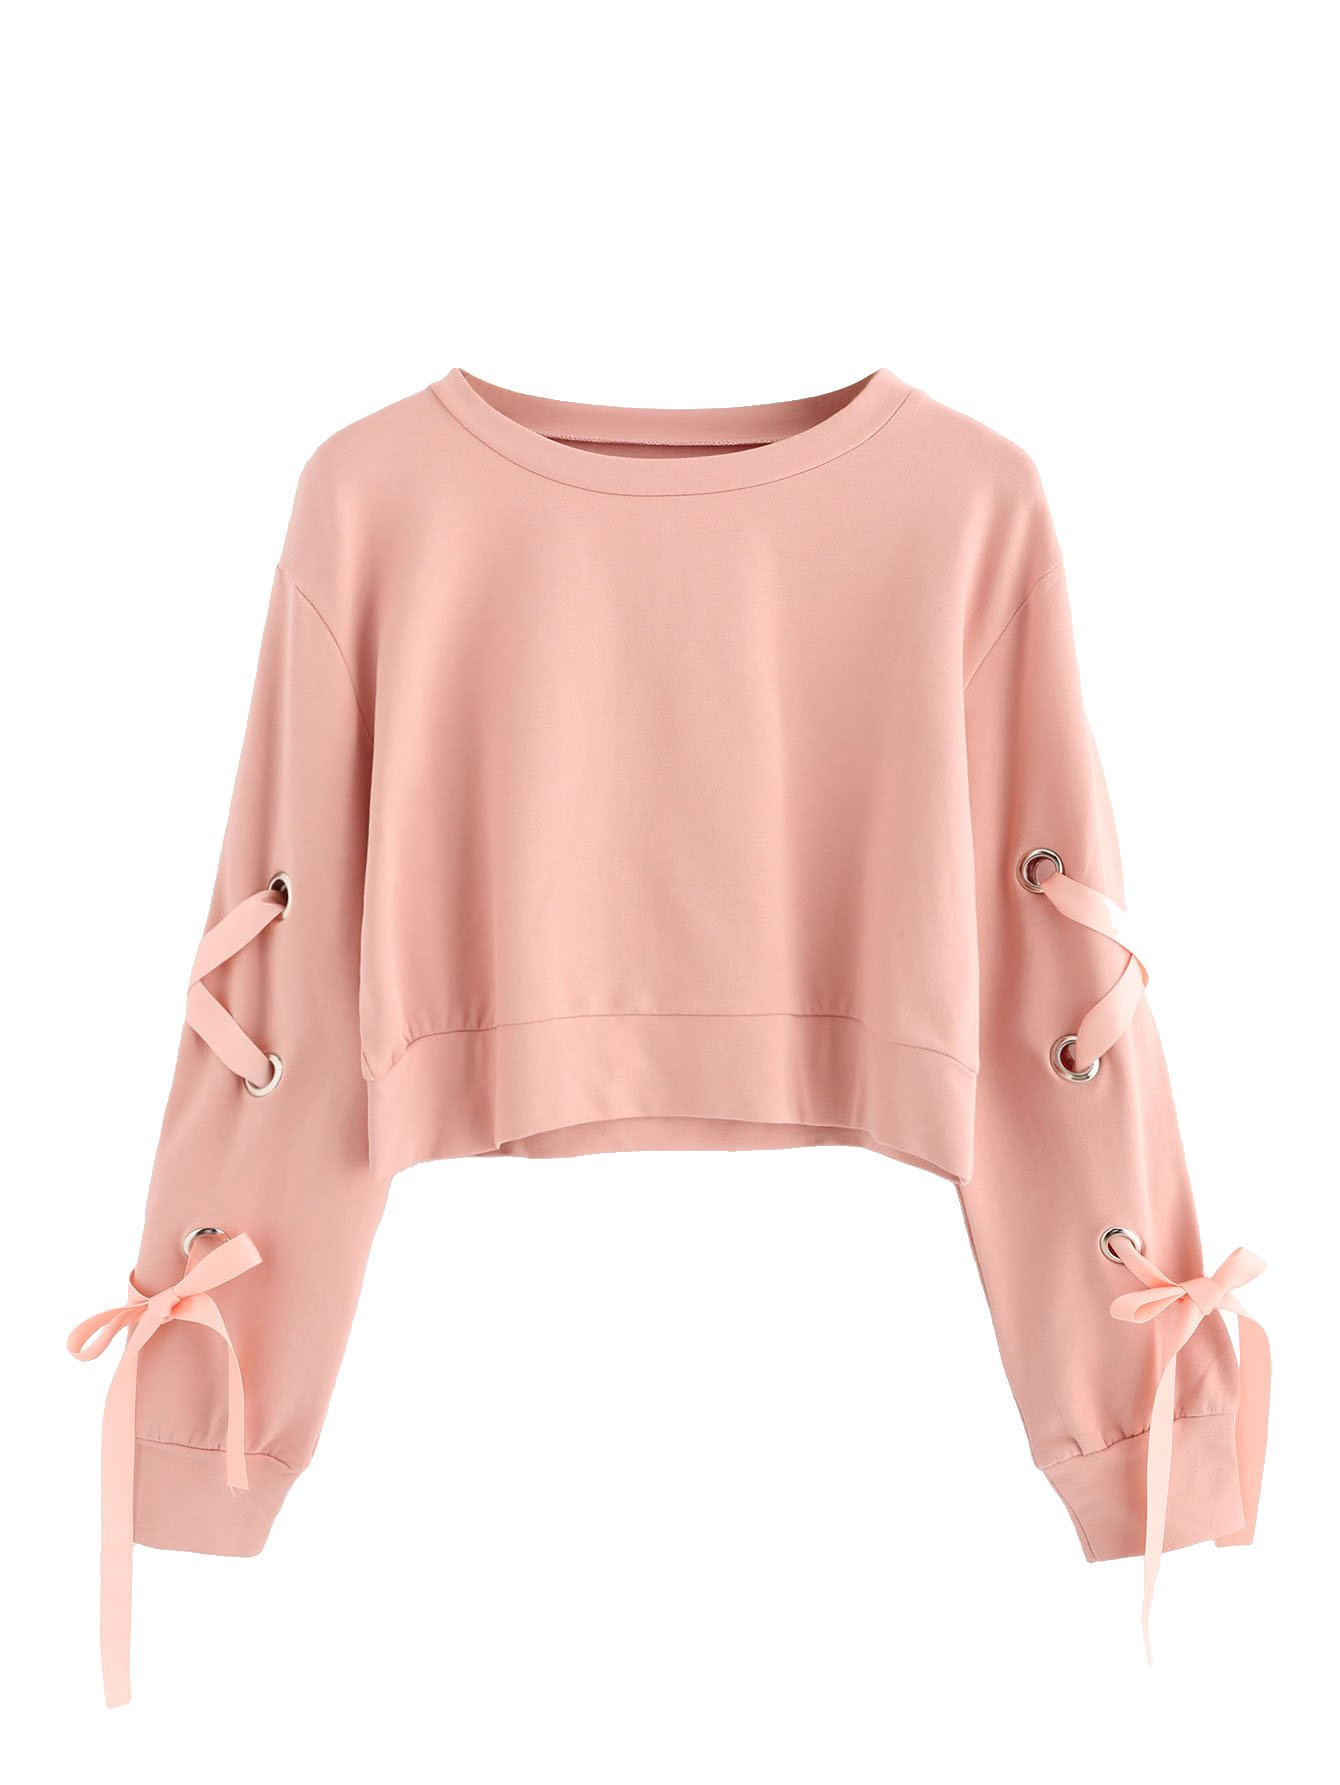 SweatyRocks Women's Casual Lace Up Long Sleeve Pullover Crop Top Sweatshirt Pink Medium